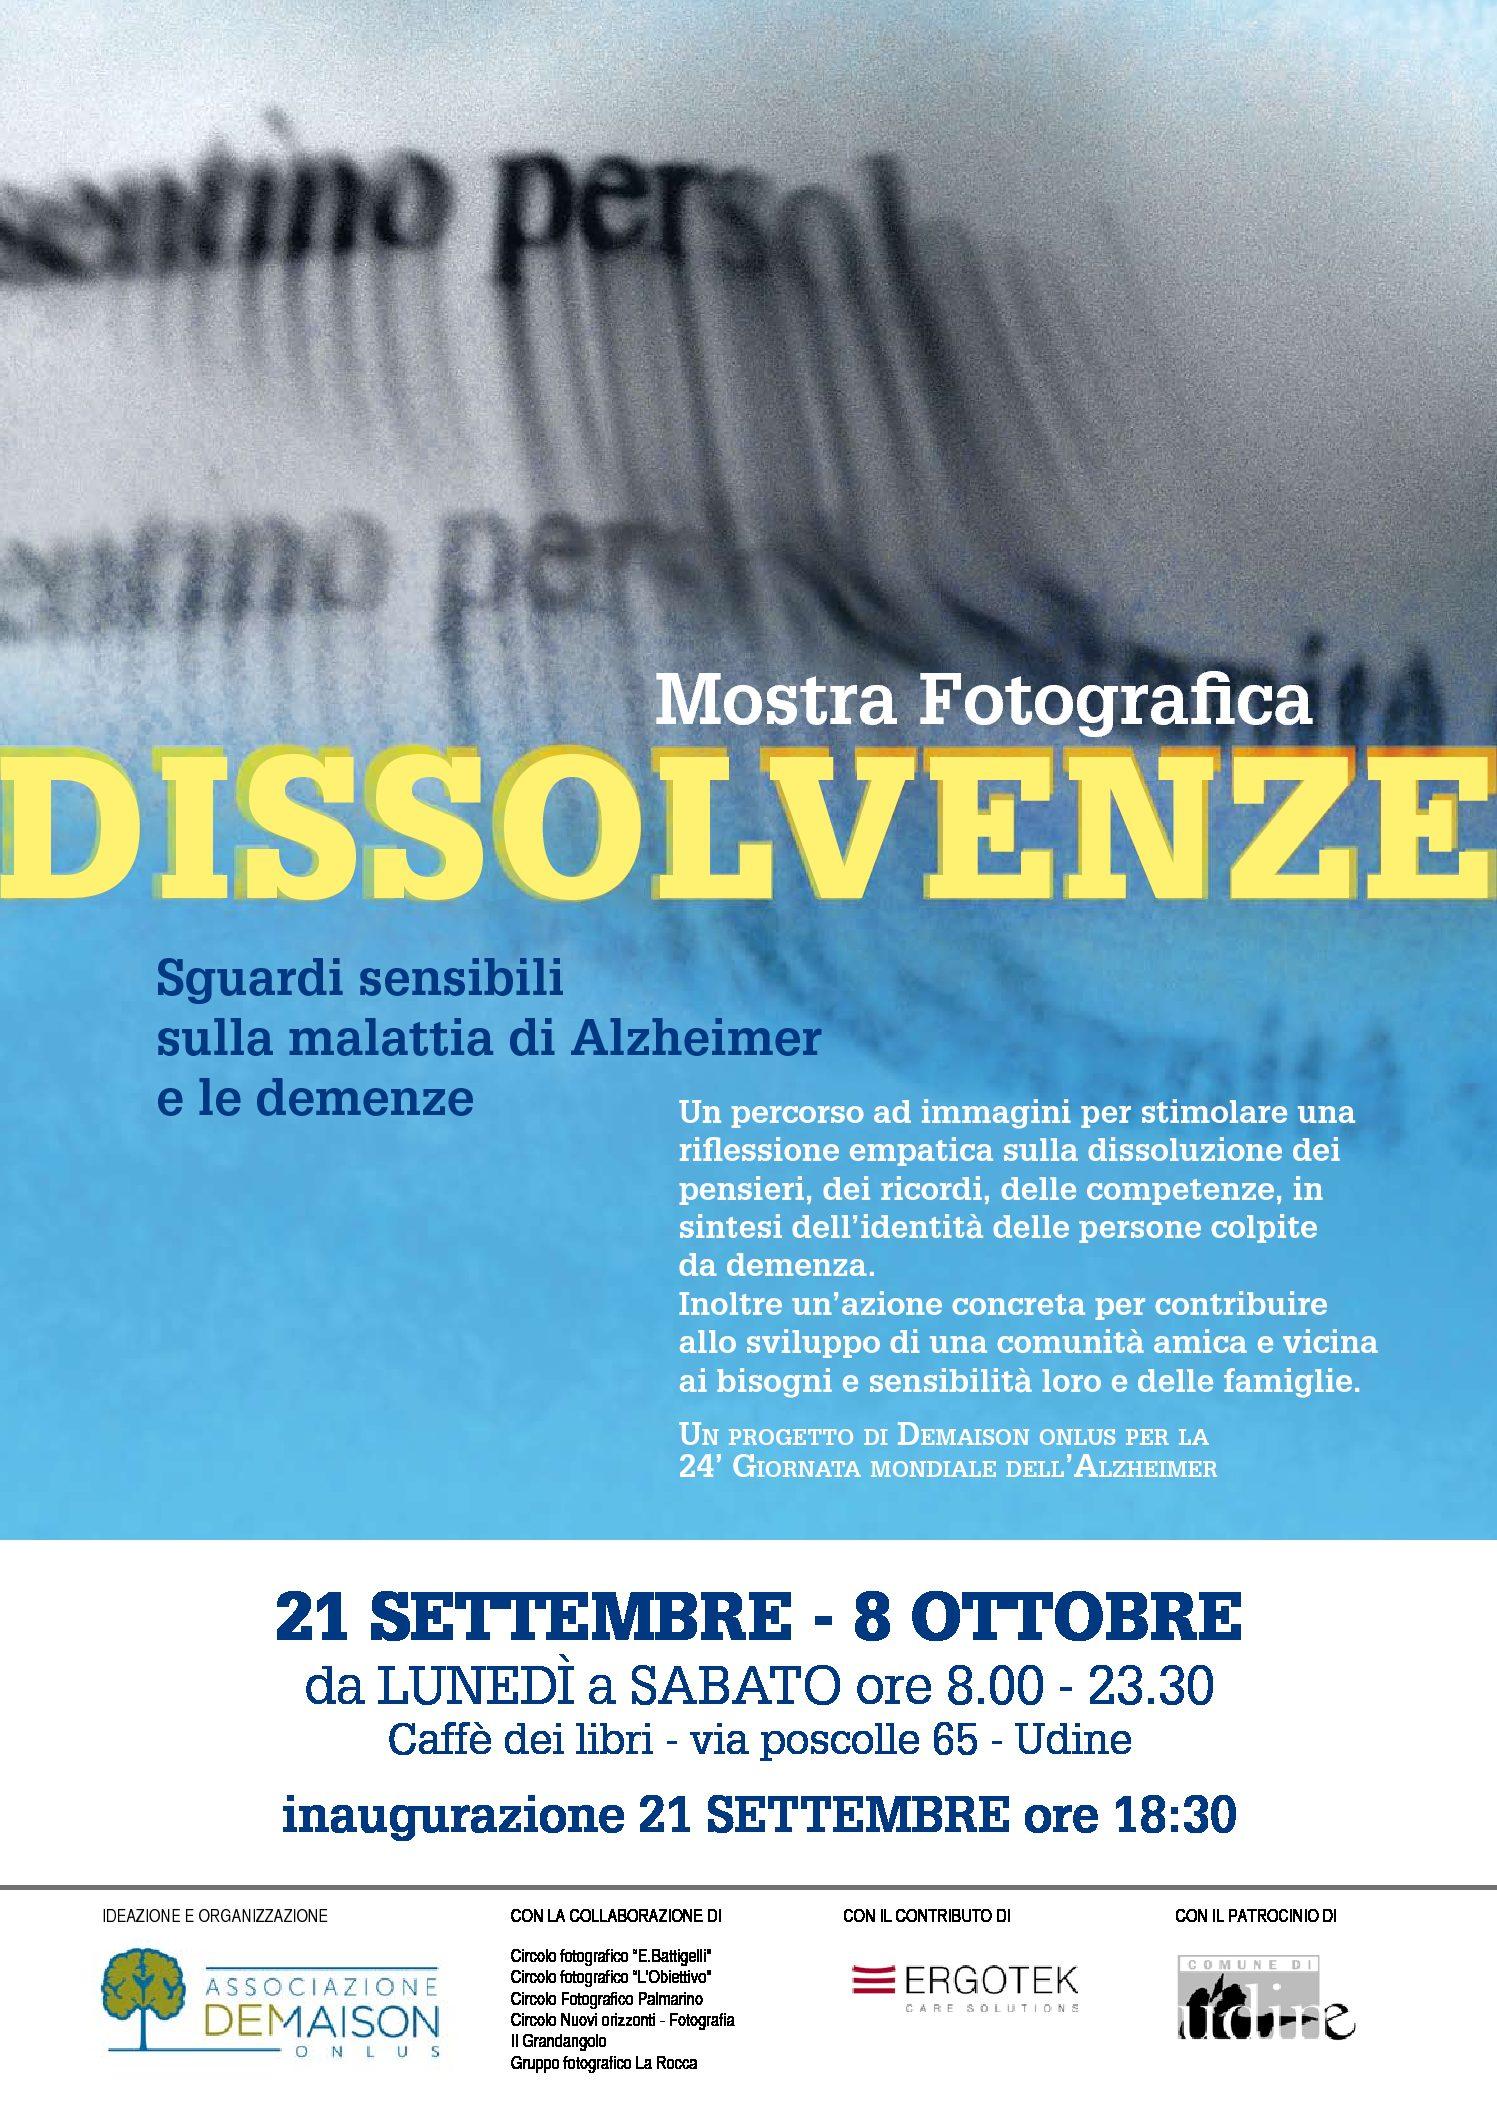 Dissolvenze, sguardi sensibili sulla malattia di Alzheimer e le demenze